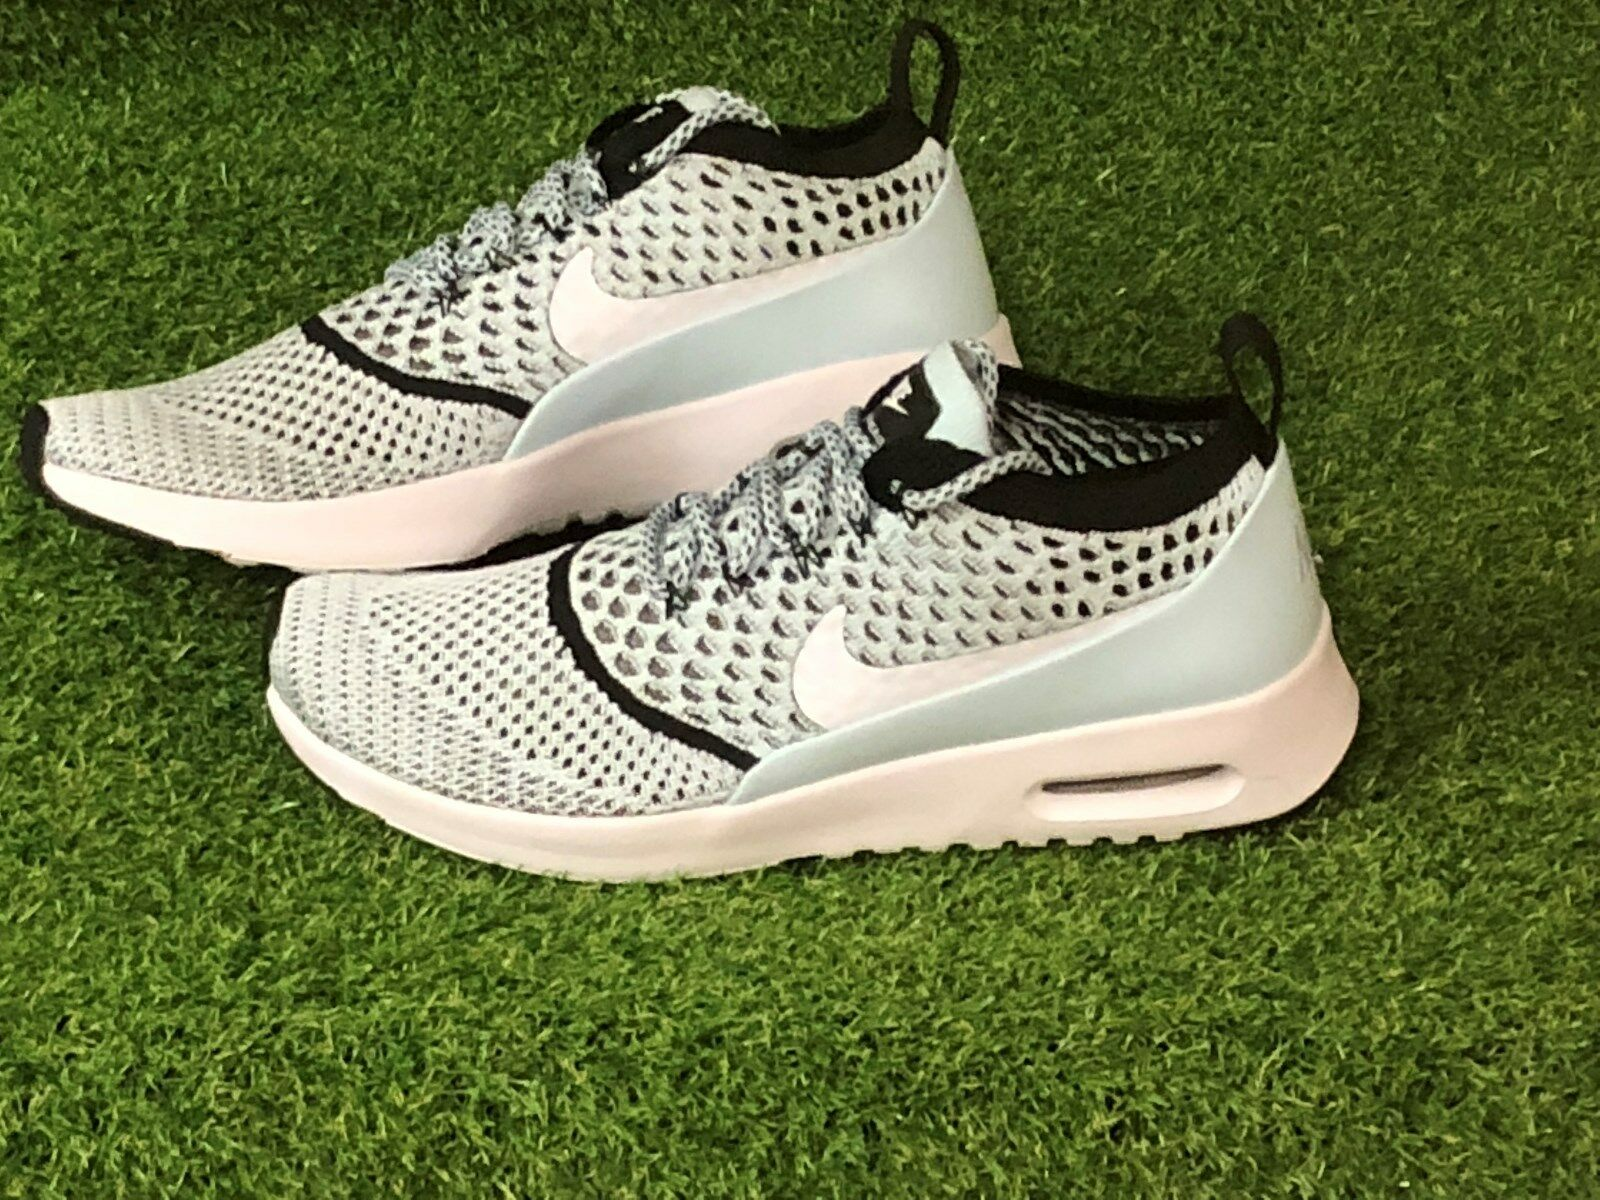 Wmns Nike Air Max Thea Thea Thea Ultra FK Femmes WoHommes  [881175 400] Taille 38,5 Neuf | élégant  | Qualité Fine  e90bcf